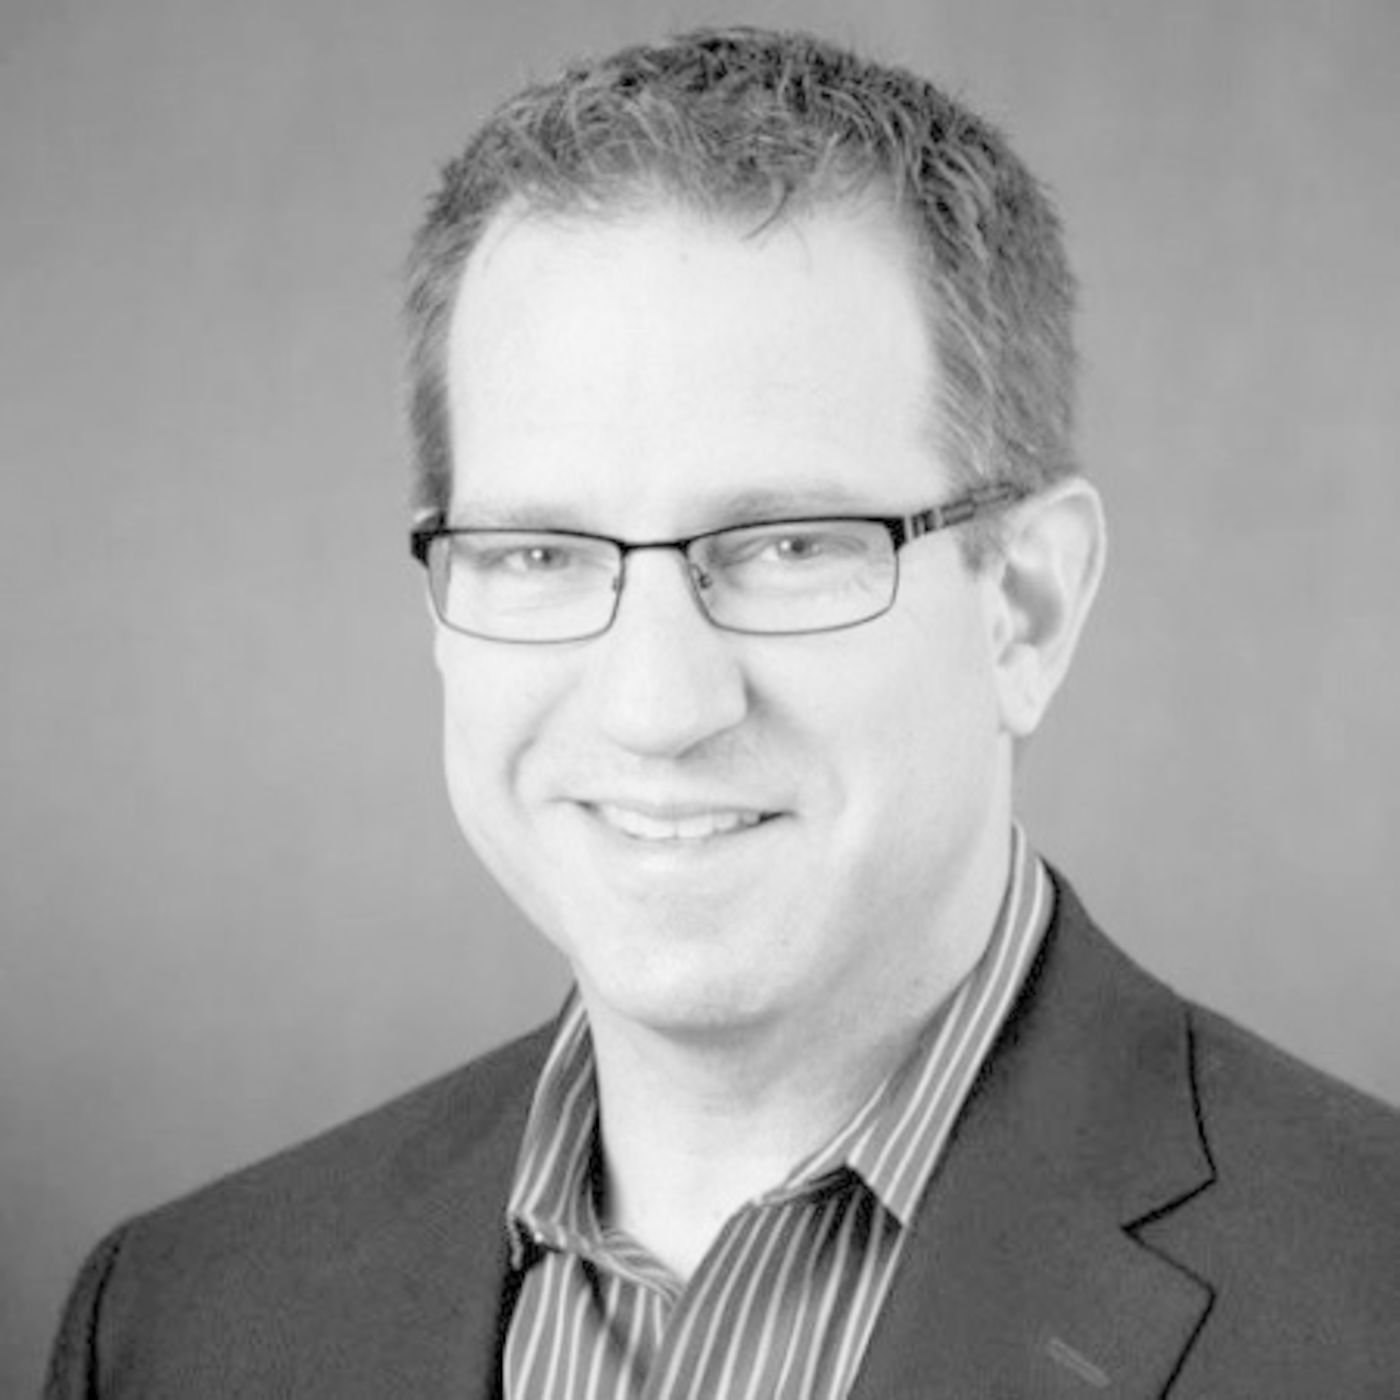 #16 - Allan Alford - CISO, Mitel Networks Corp - GDPR for Leaders